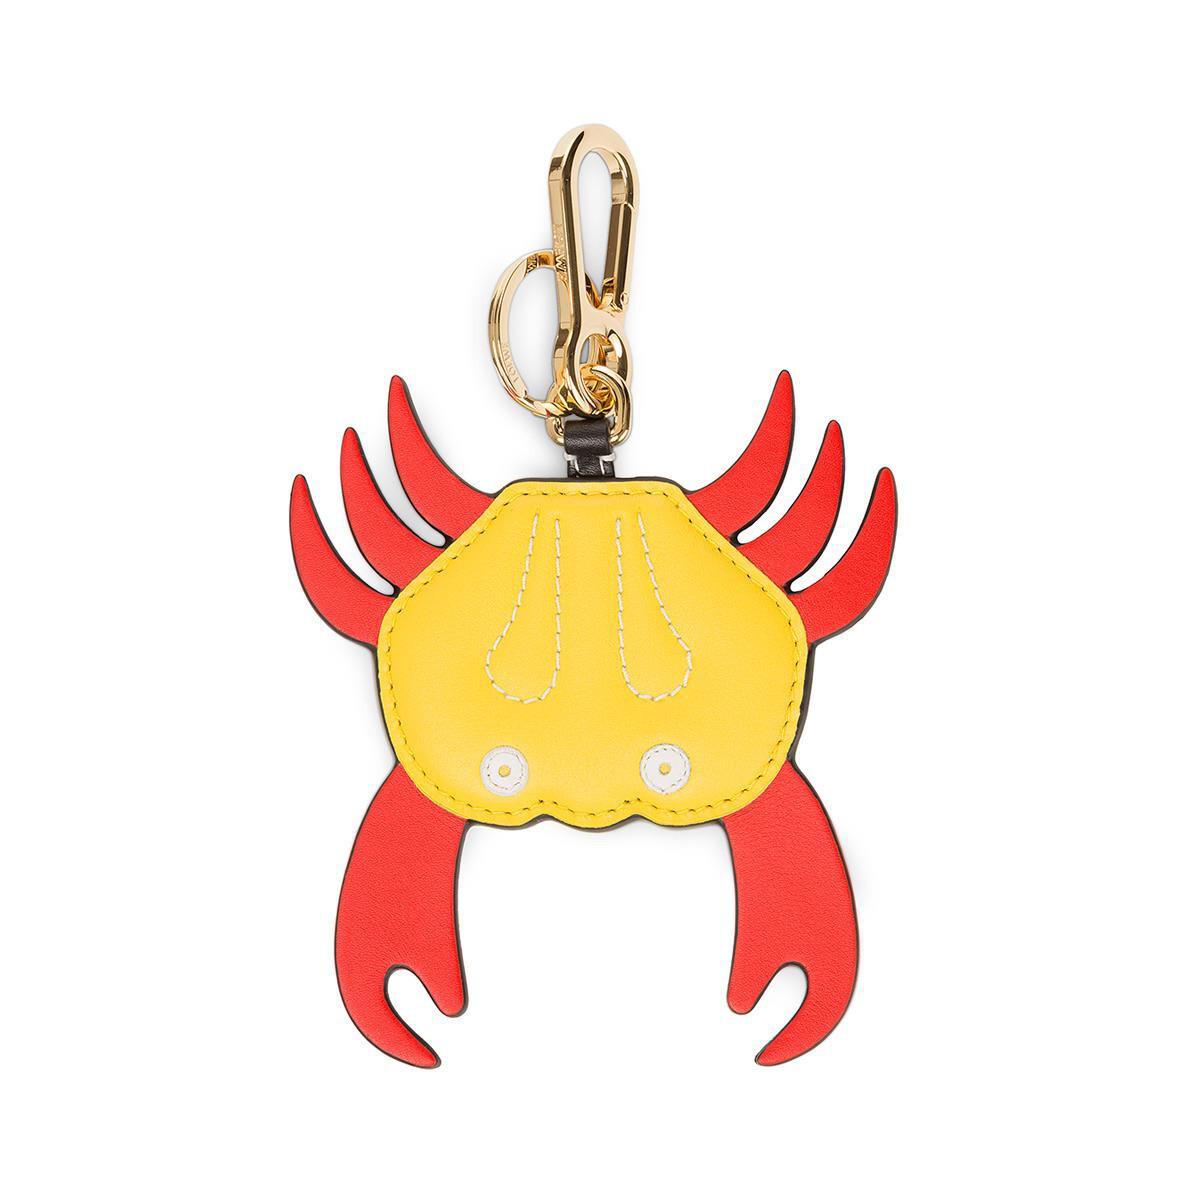 LOEWE Charm Cangrejo Rojo/Amarillo front